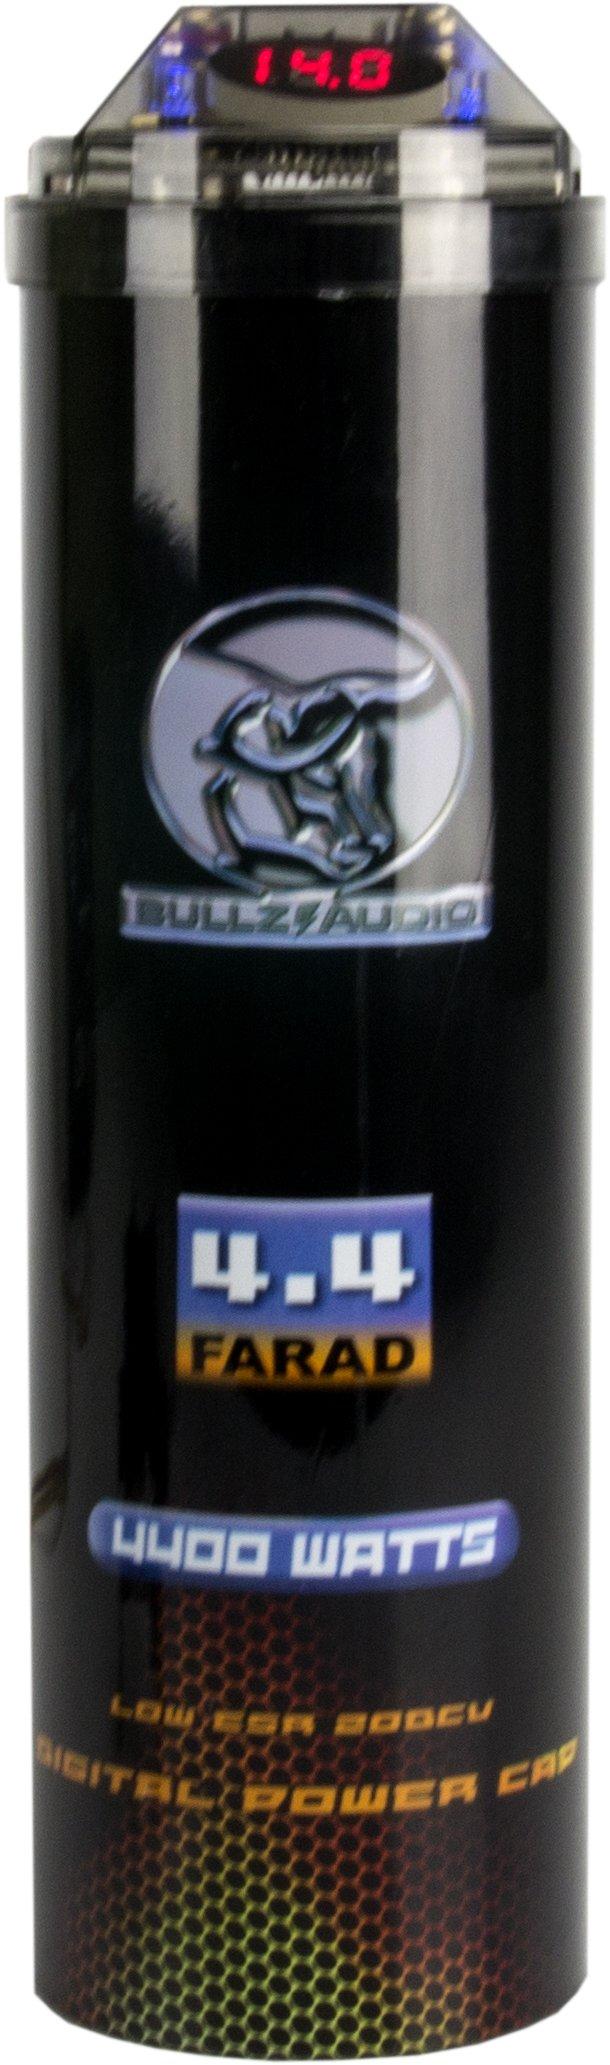 (2) BULLZ AUDIO 4400W 12V BCAP 4.4 Digital Car Power Farad Capacitors | BCAP4.4 by BULLZ AUDIO (Image #3)